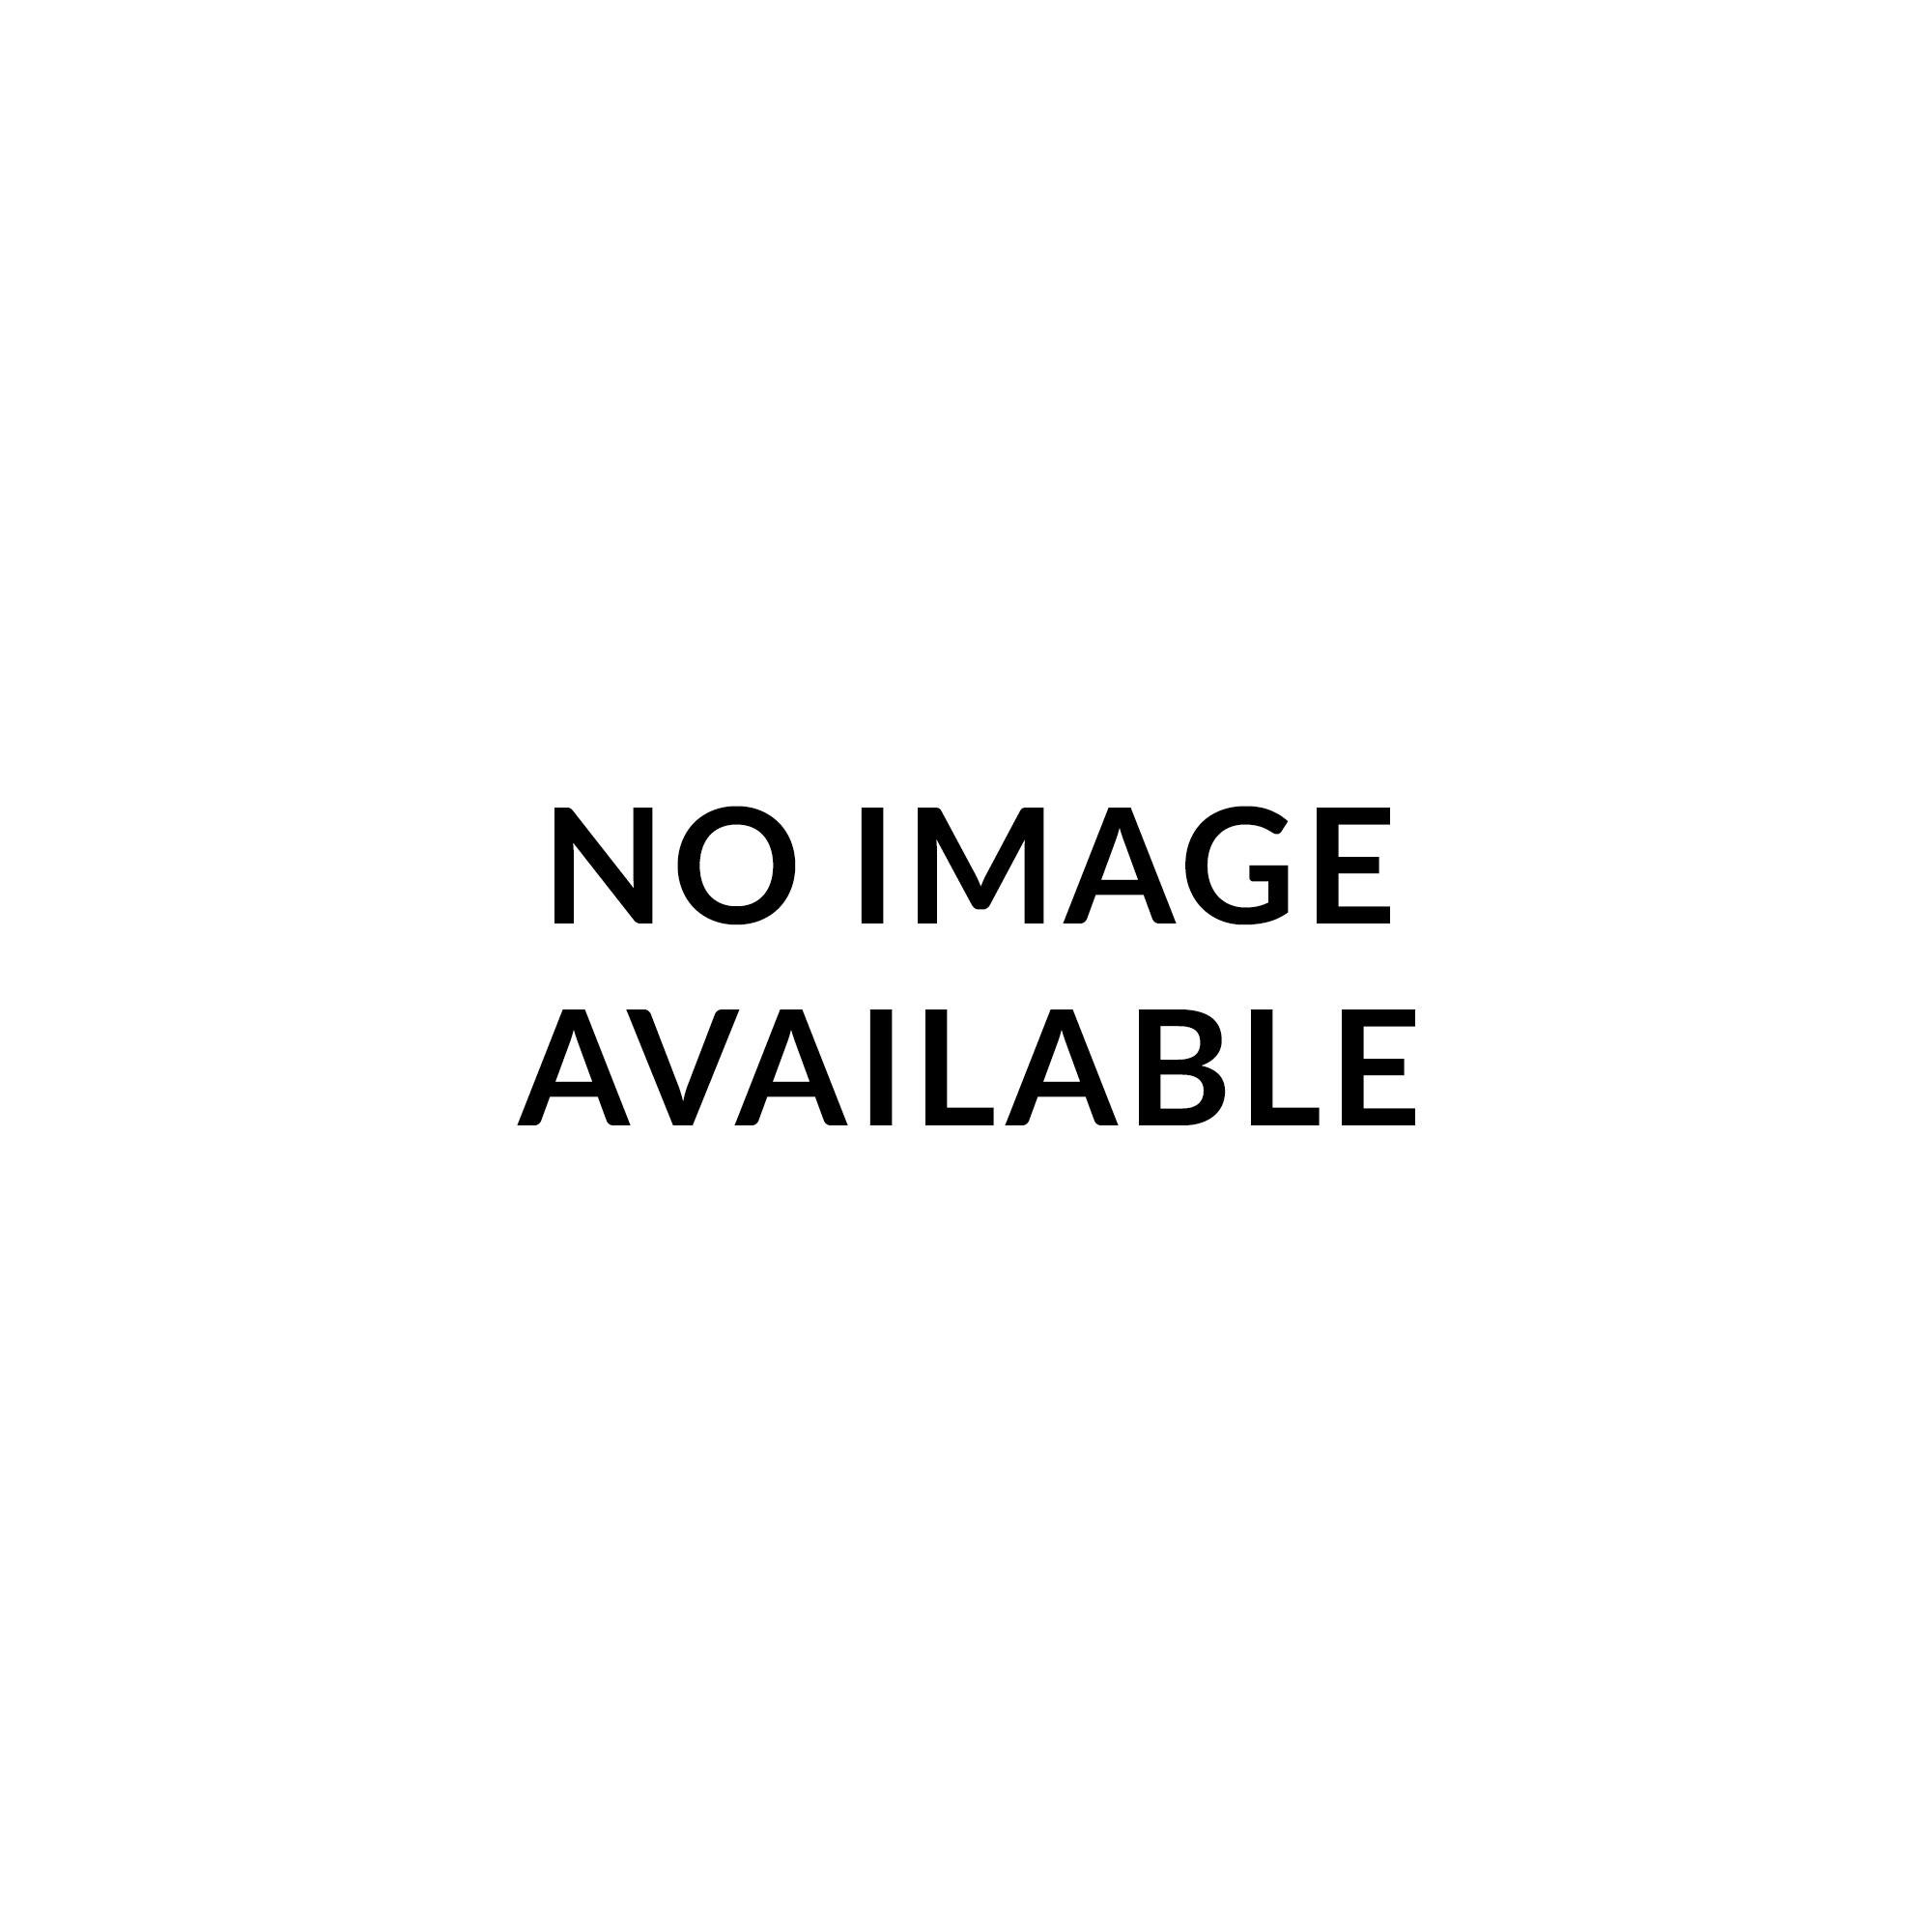 D'Addario XB110SL Nickel Wound XL Bass Single String .110 Super Long Scale